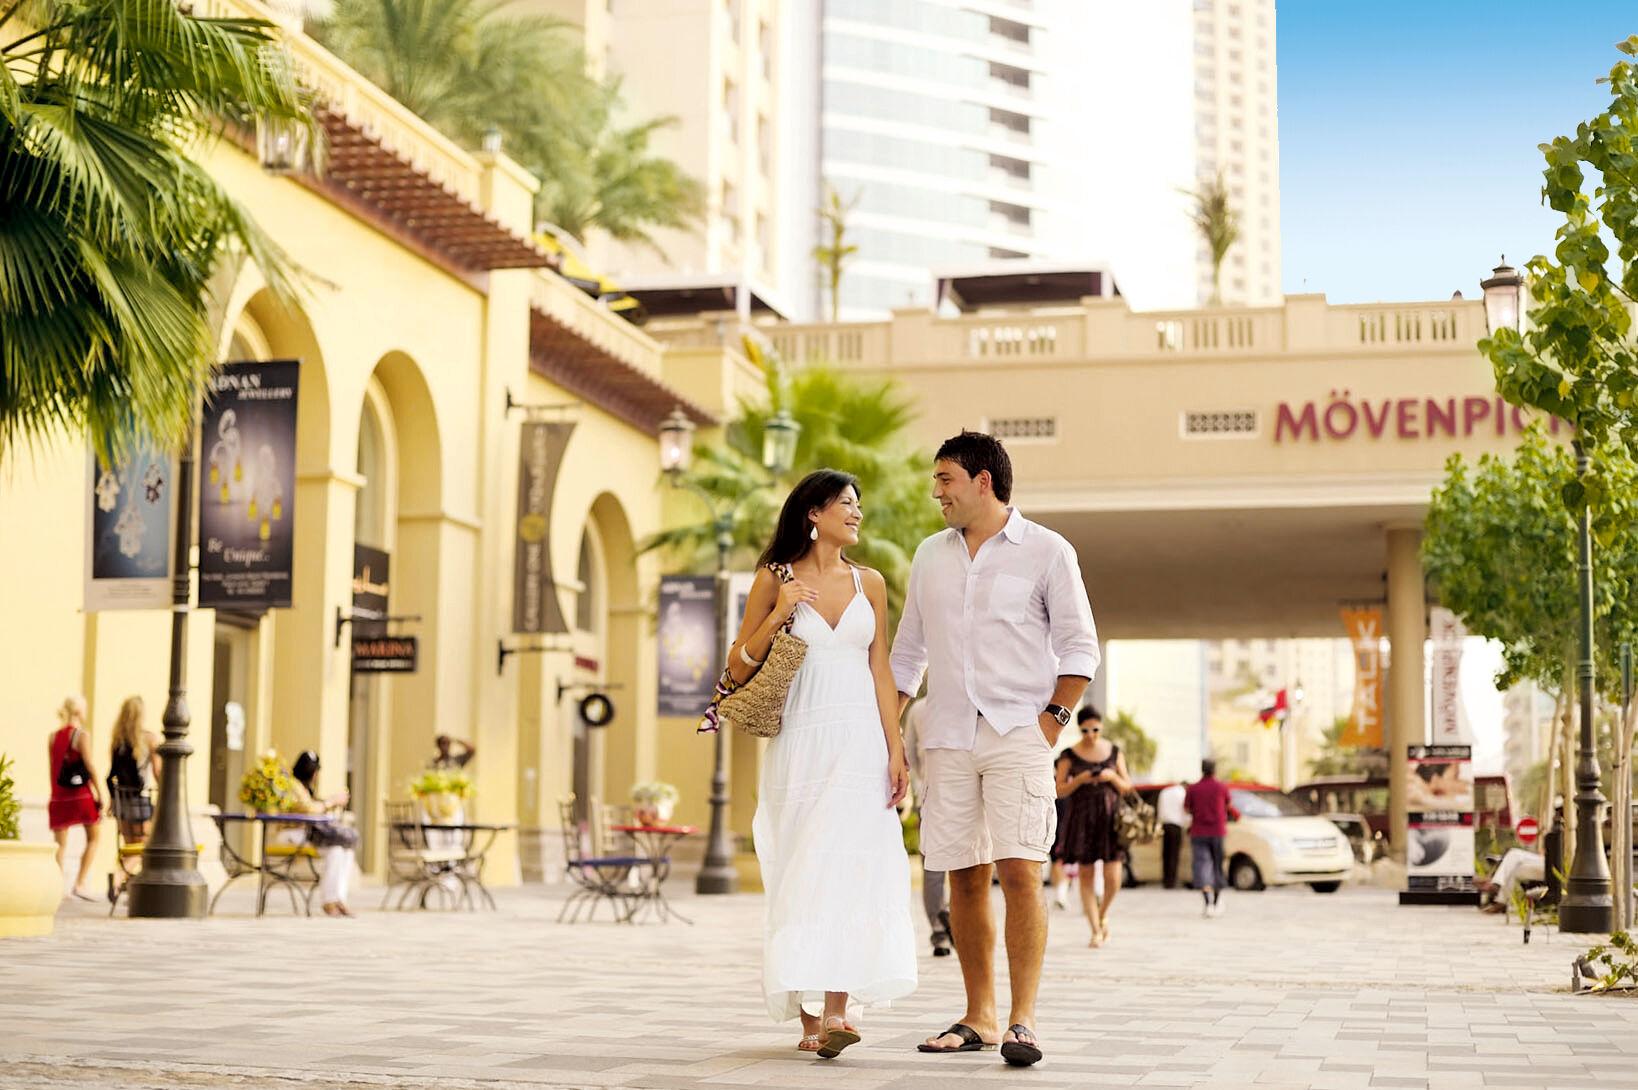 Mövenpick Hotel Jumeirah Beach - 5*